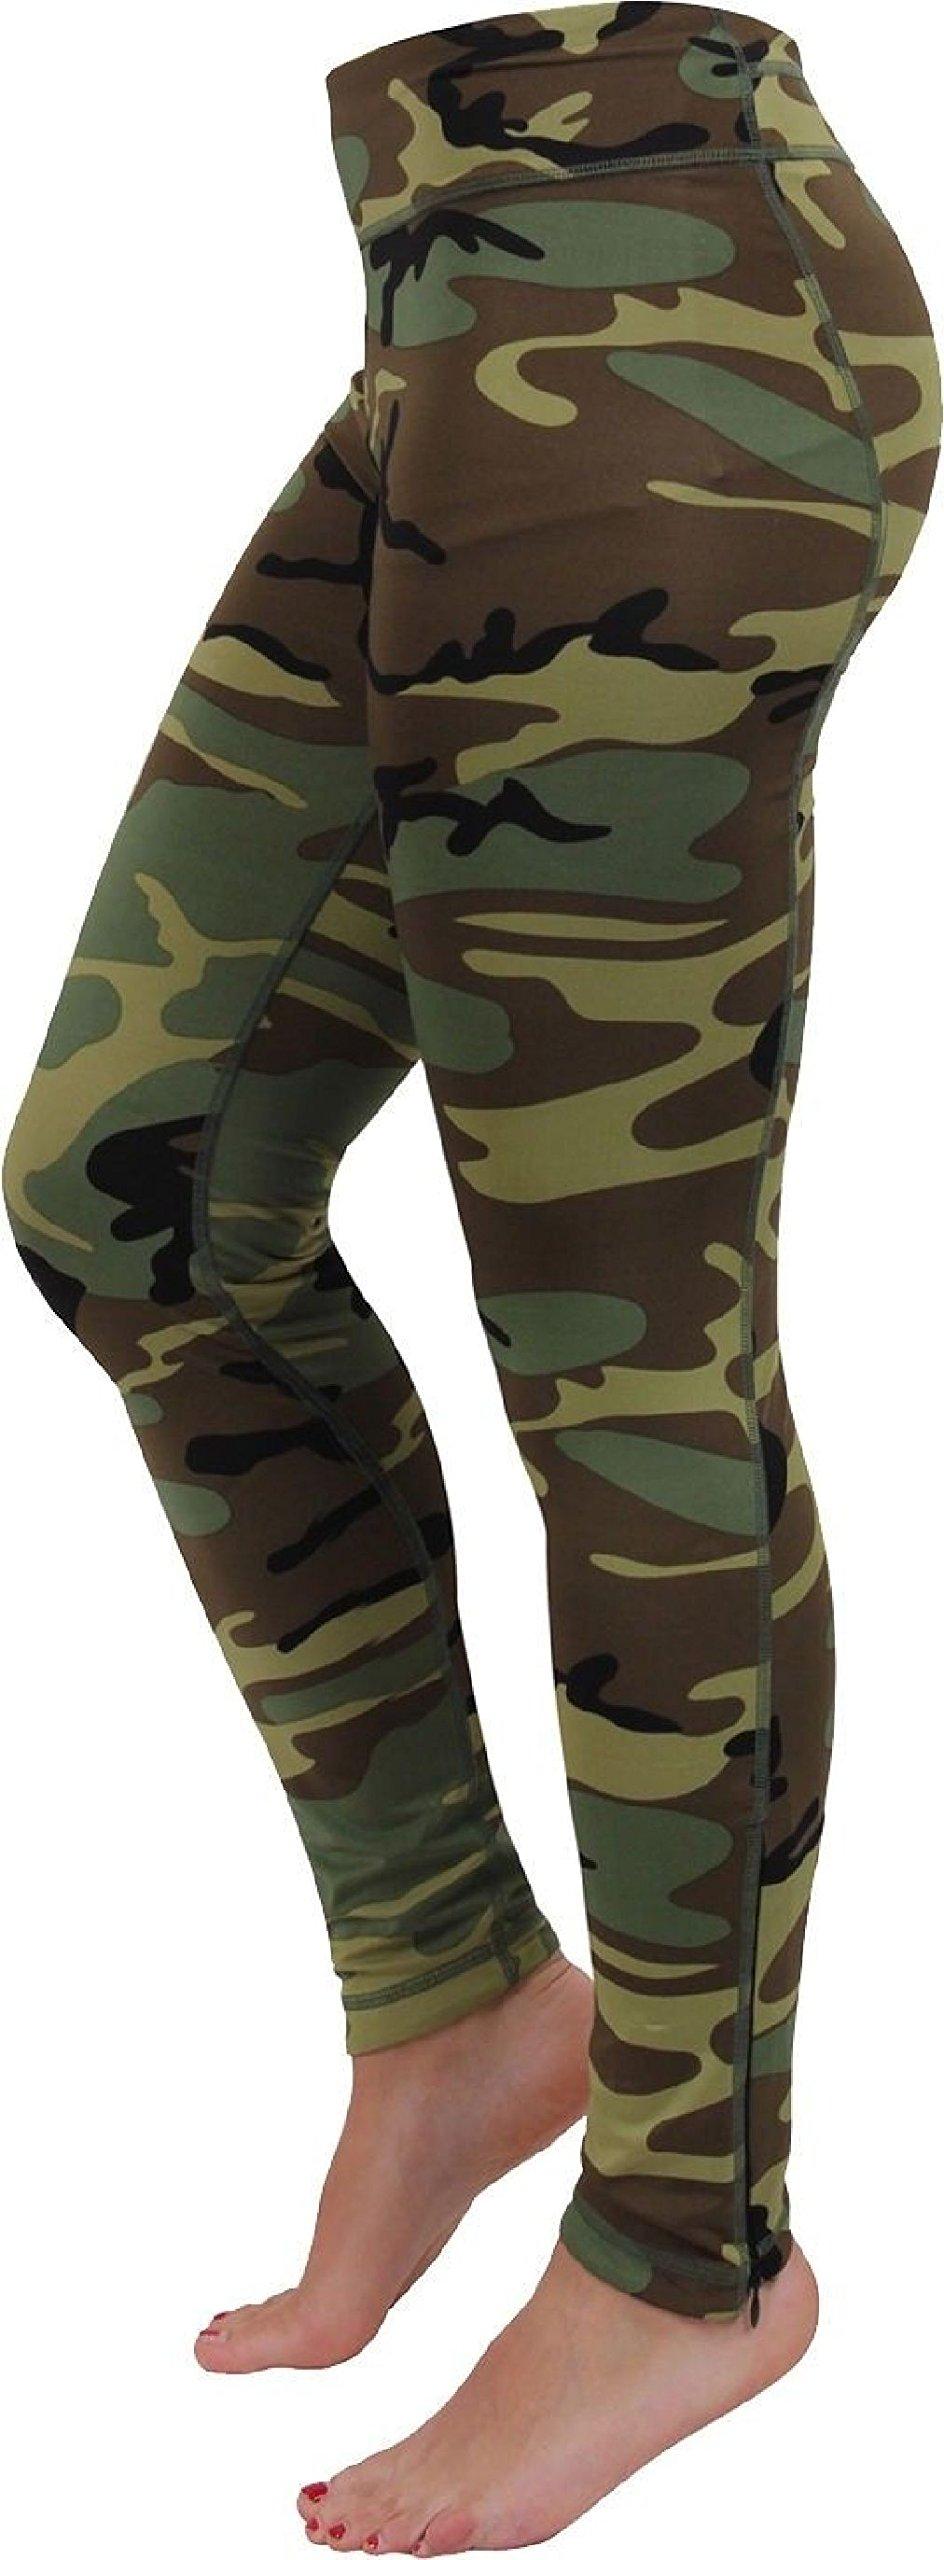 Womens Woodland Camouflage Performance Spandex Leggings